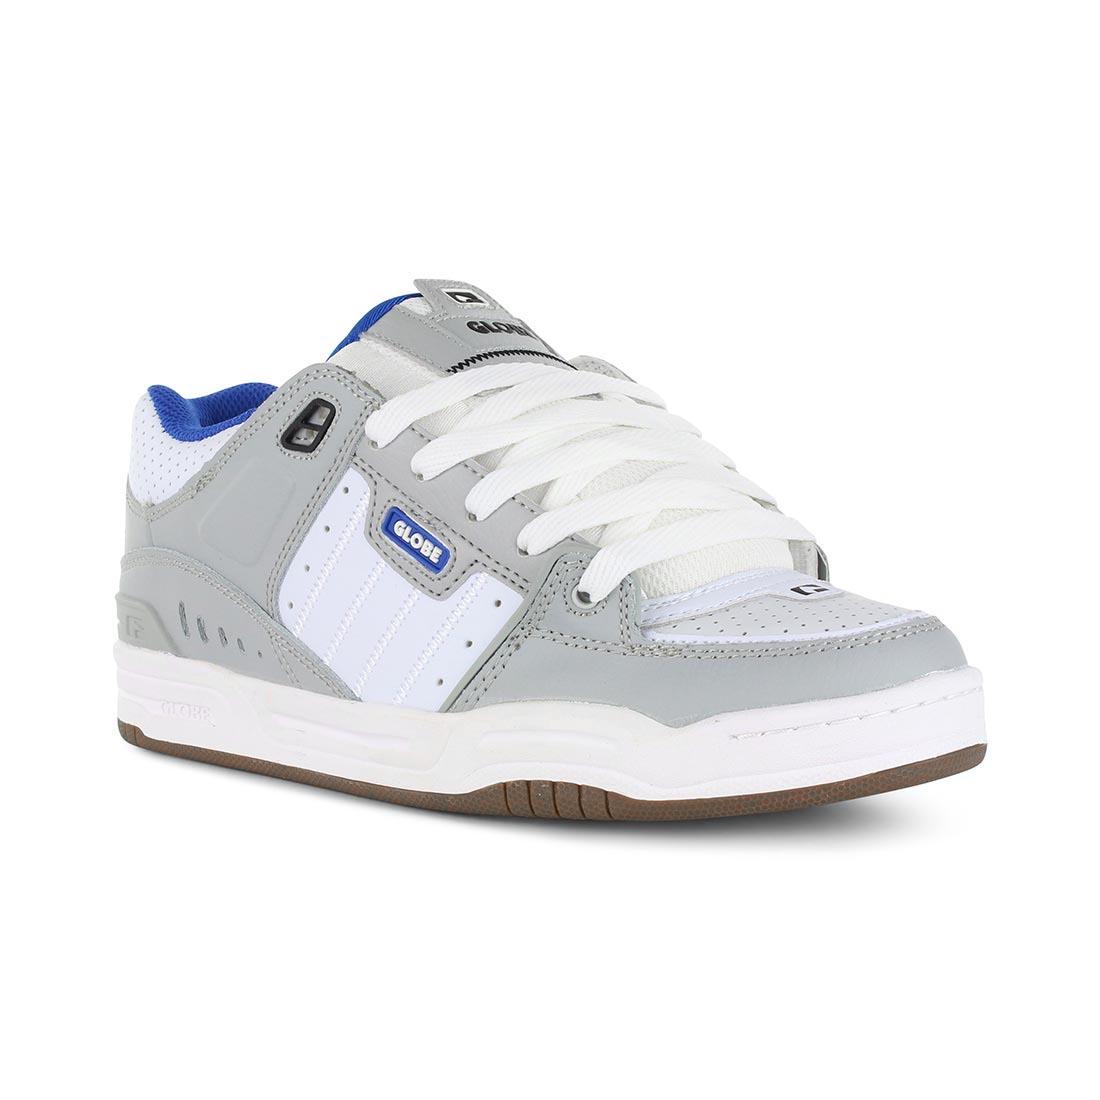 Globe Shoes Fusion - Grey Blue White